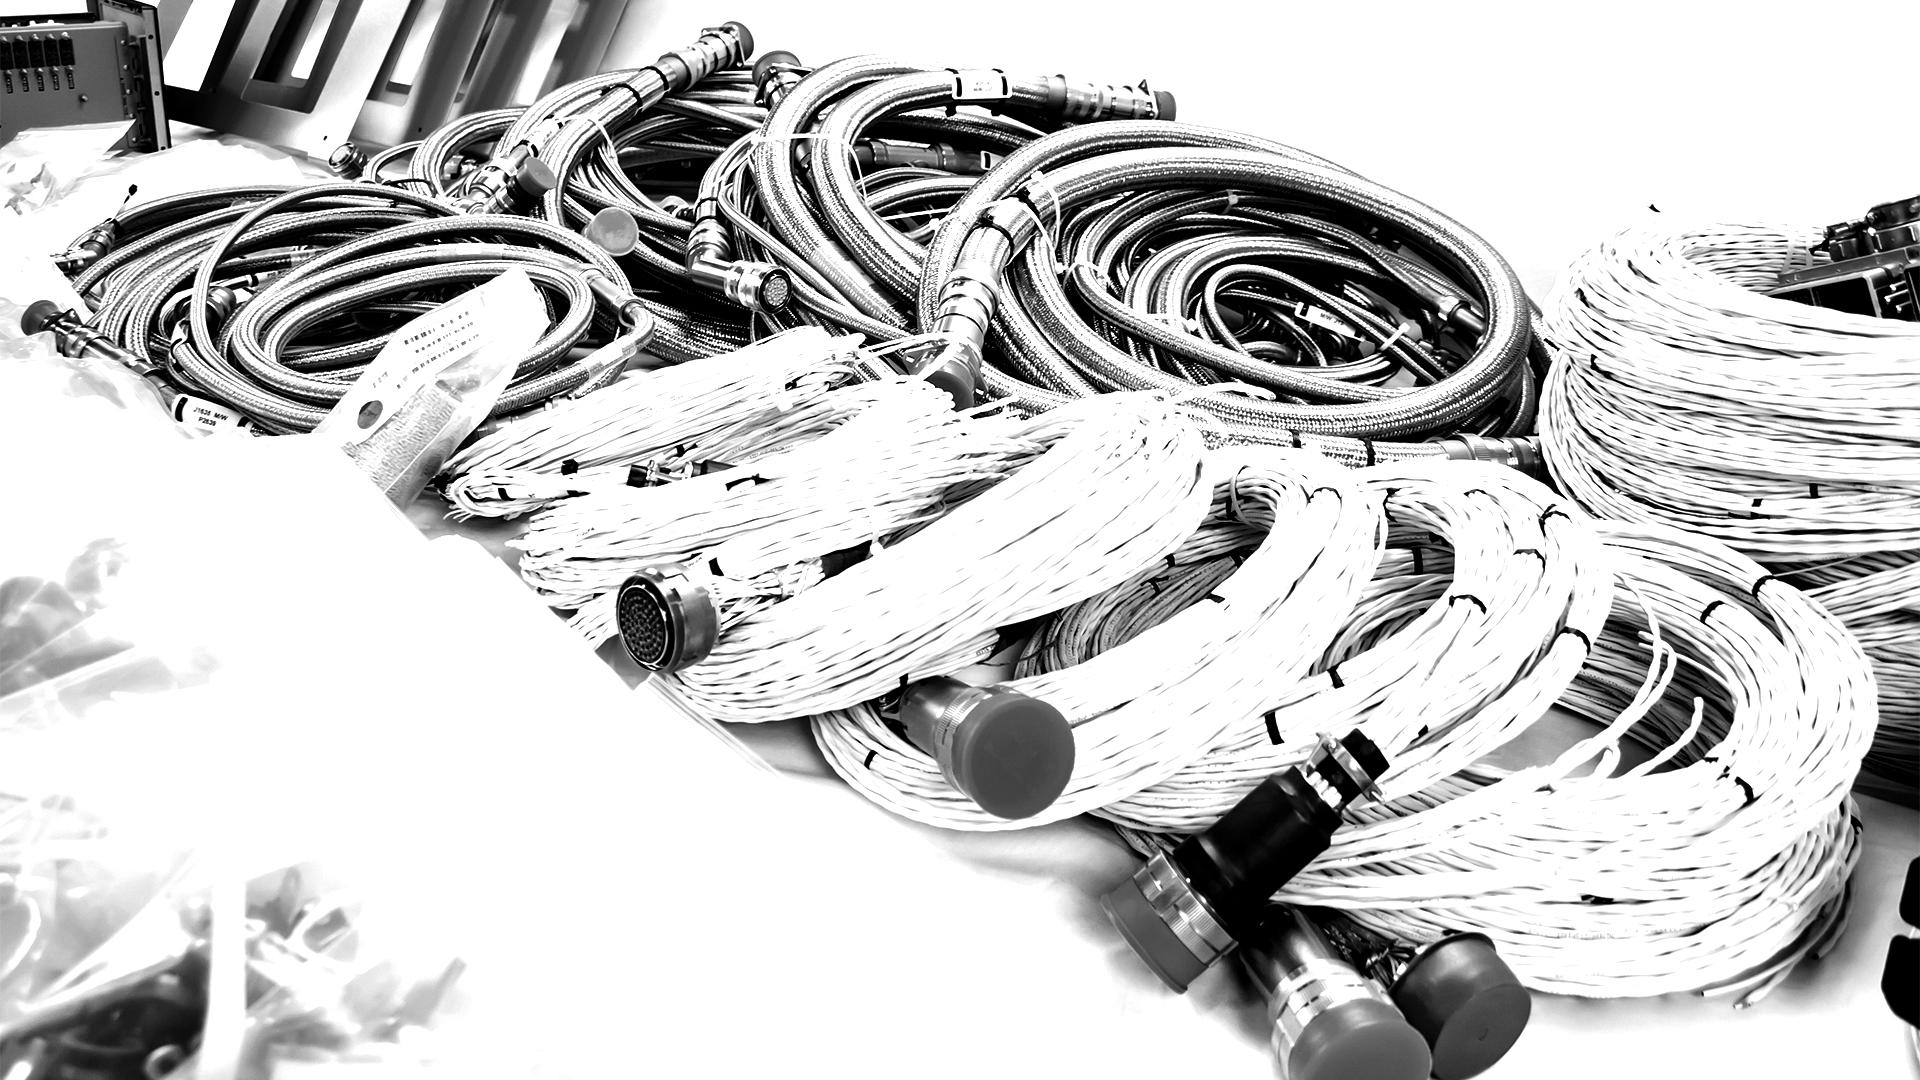 aircraft wire harnes manufacturer [ 1920 x 1080 Pixel ]